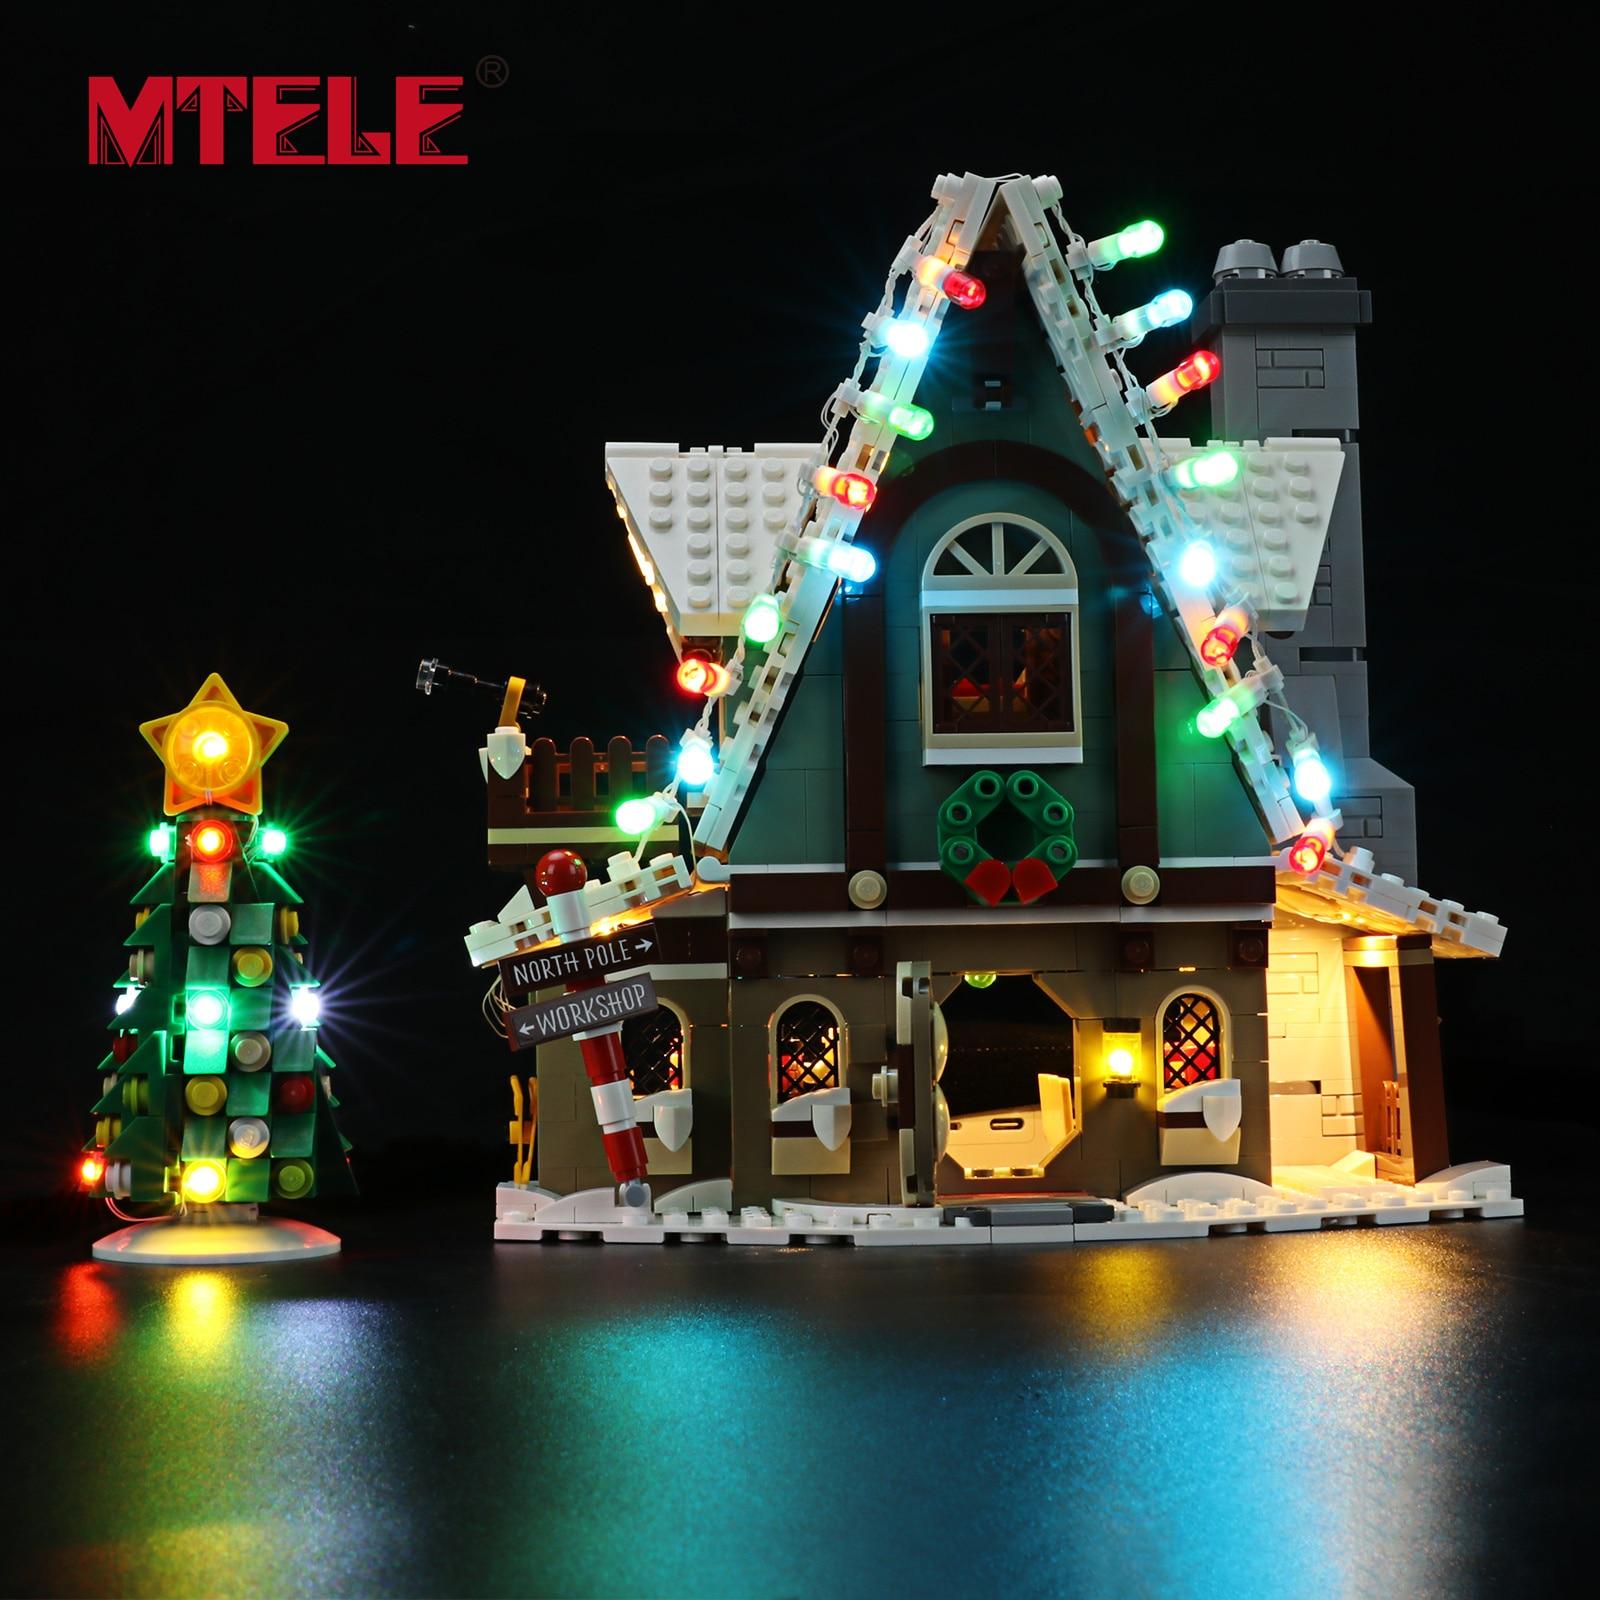 MTELE مجموعة إضاءة LED ل 10275 قزم نادي البيت هدية الكريسماس